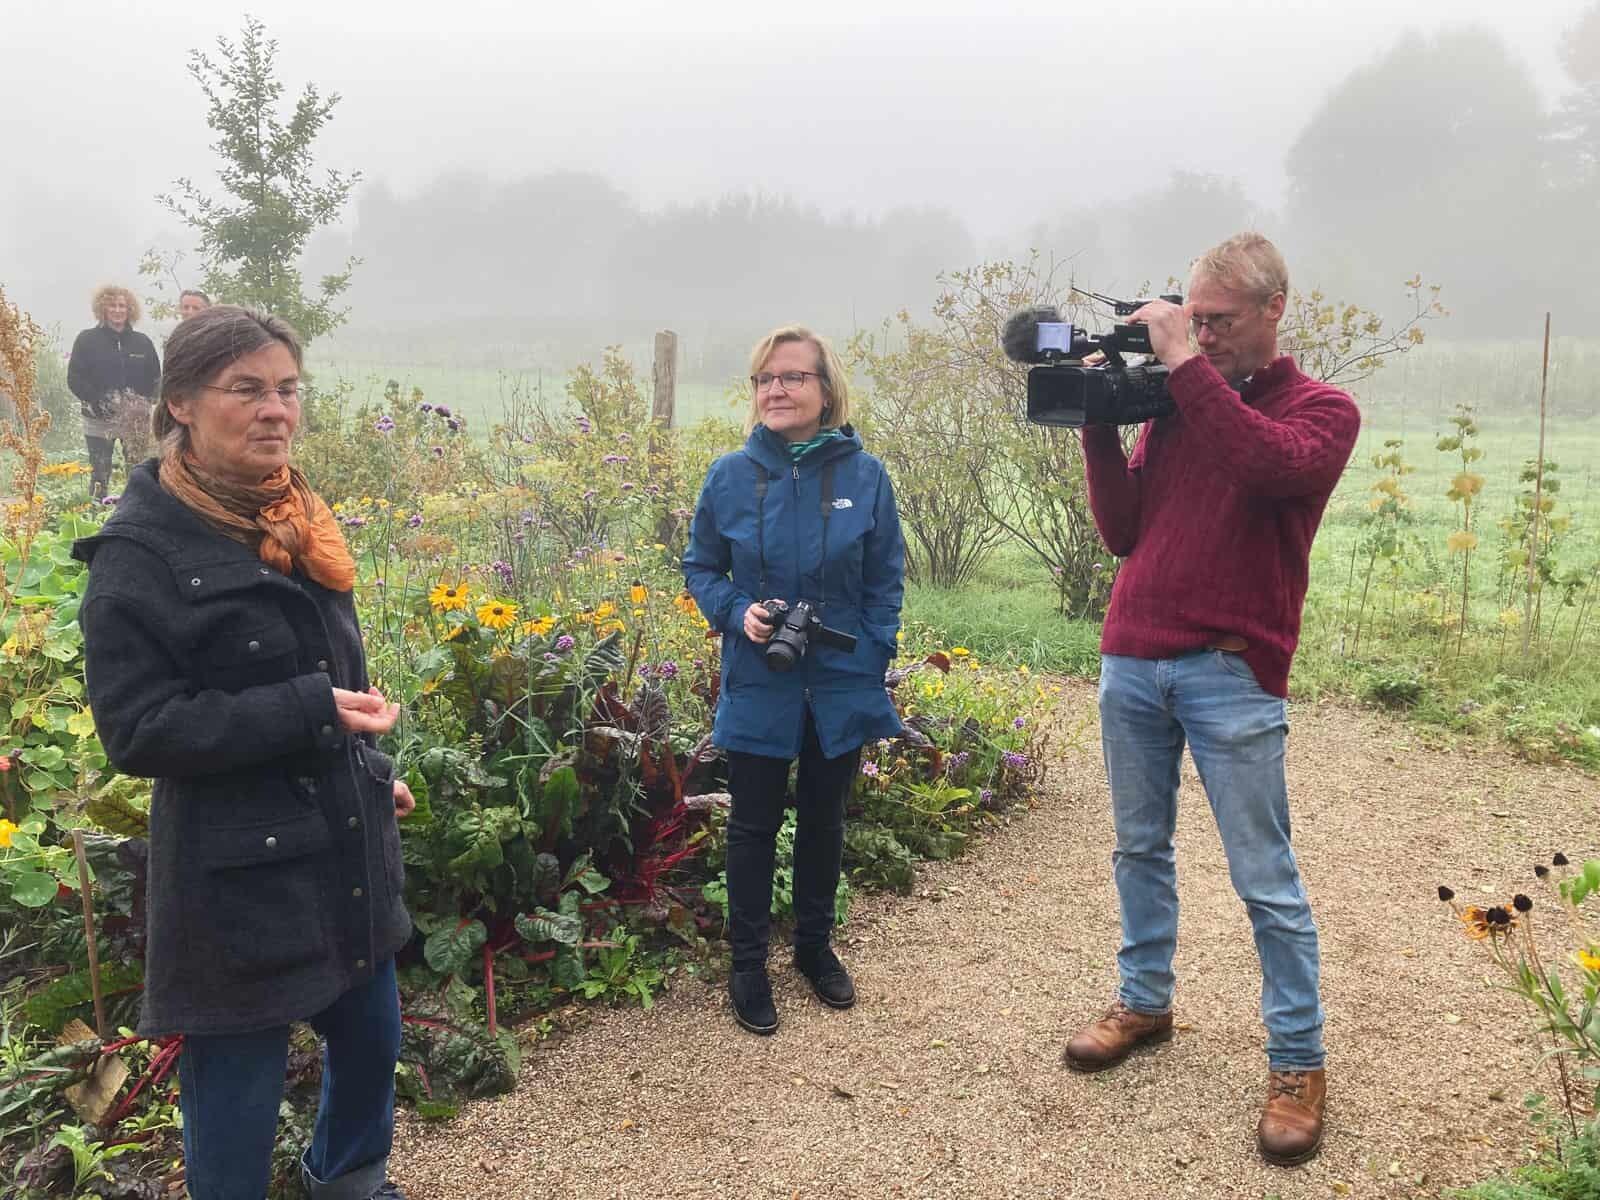 Foto: Dreharbeiten zum Insektenschutz bei Karin Falk. Fotoautor: Gerd Schriefer